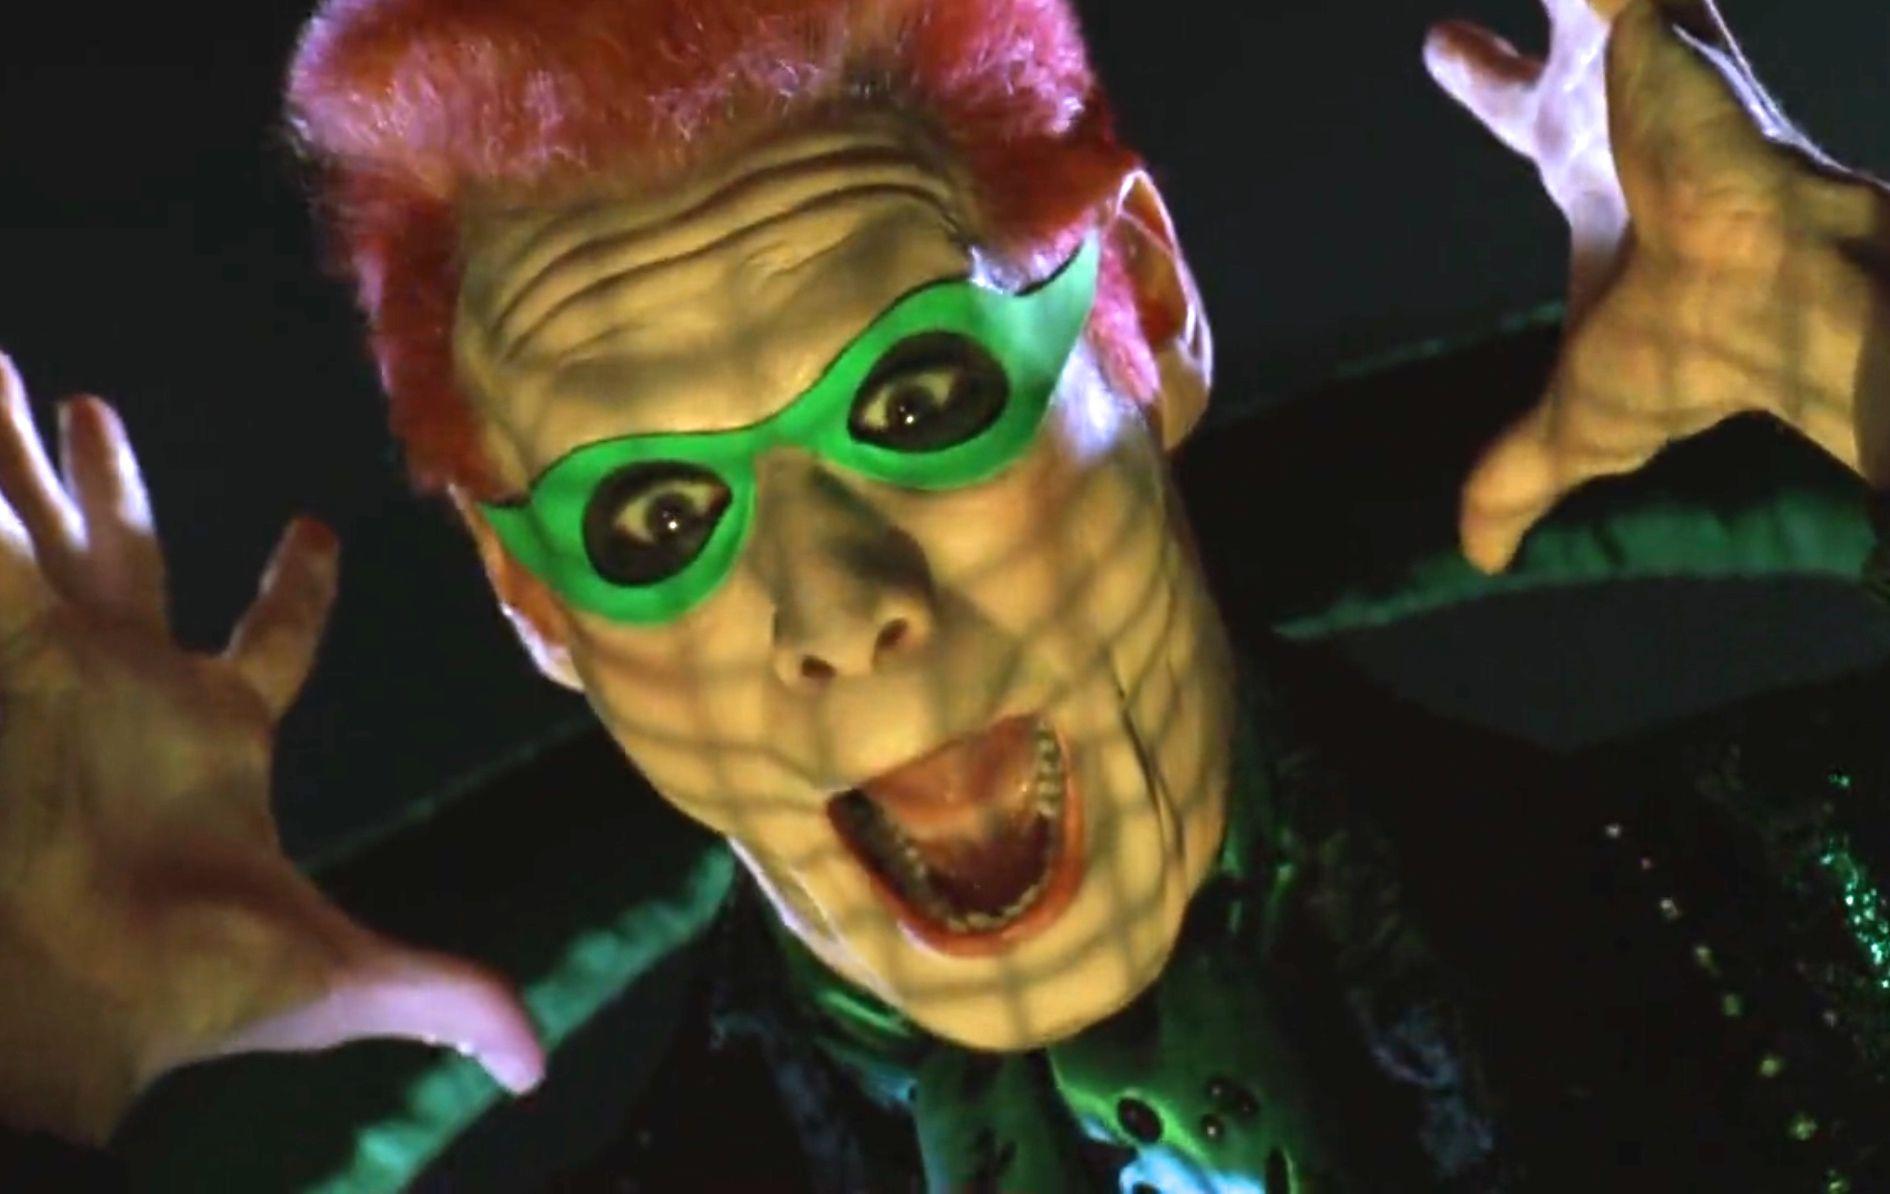 N°10 Jim Carrey as Edward Nygma / The Riddler Batman